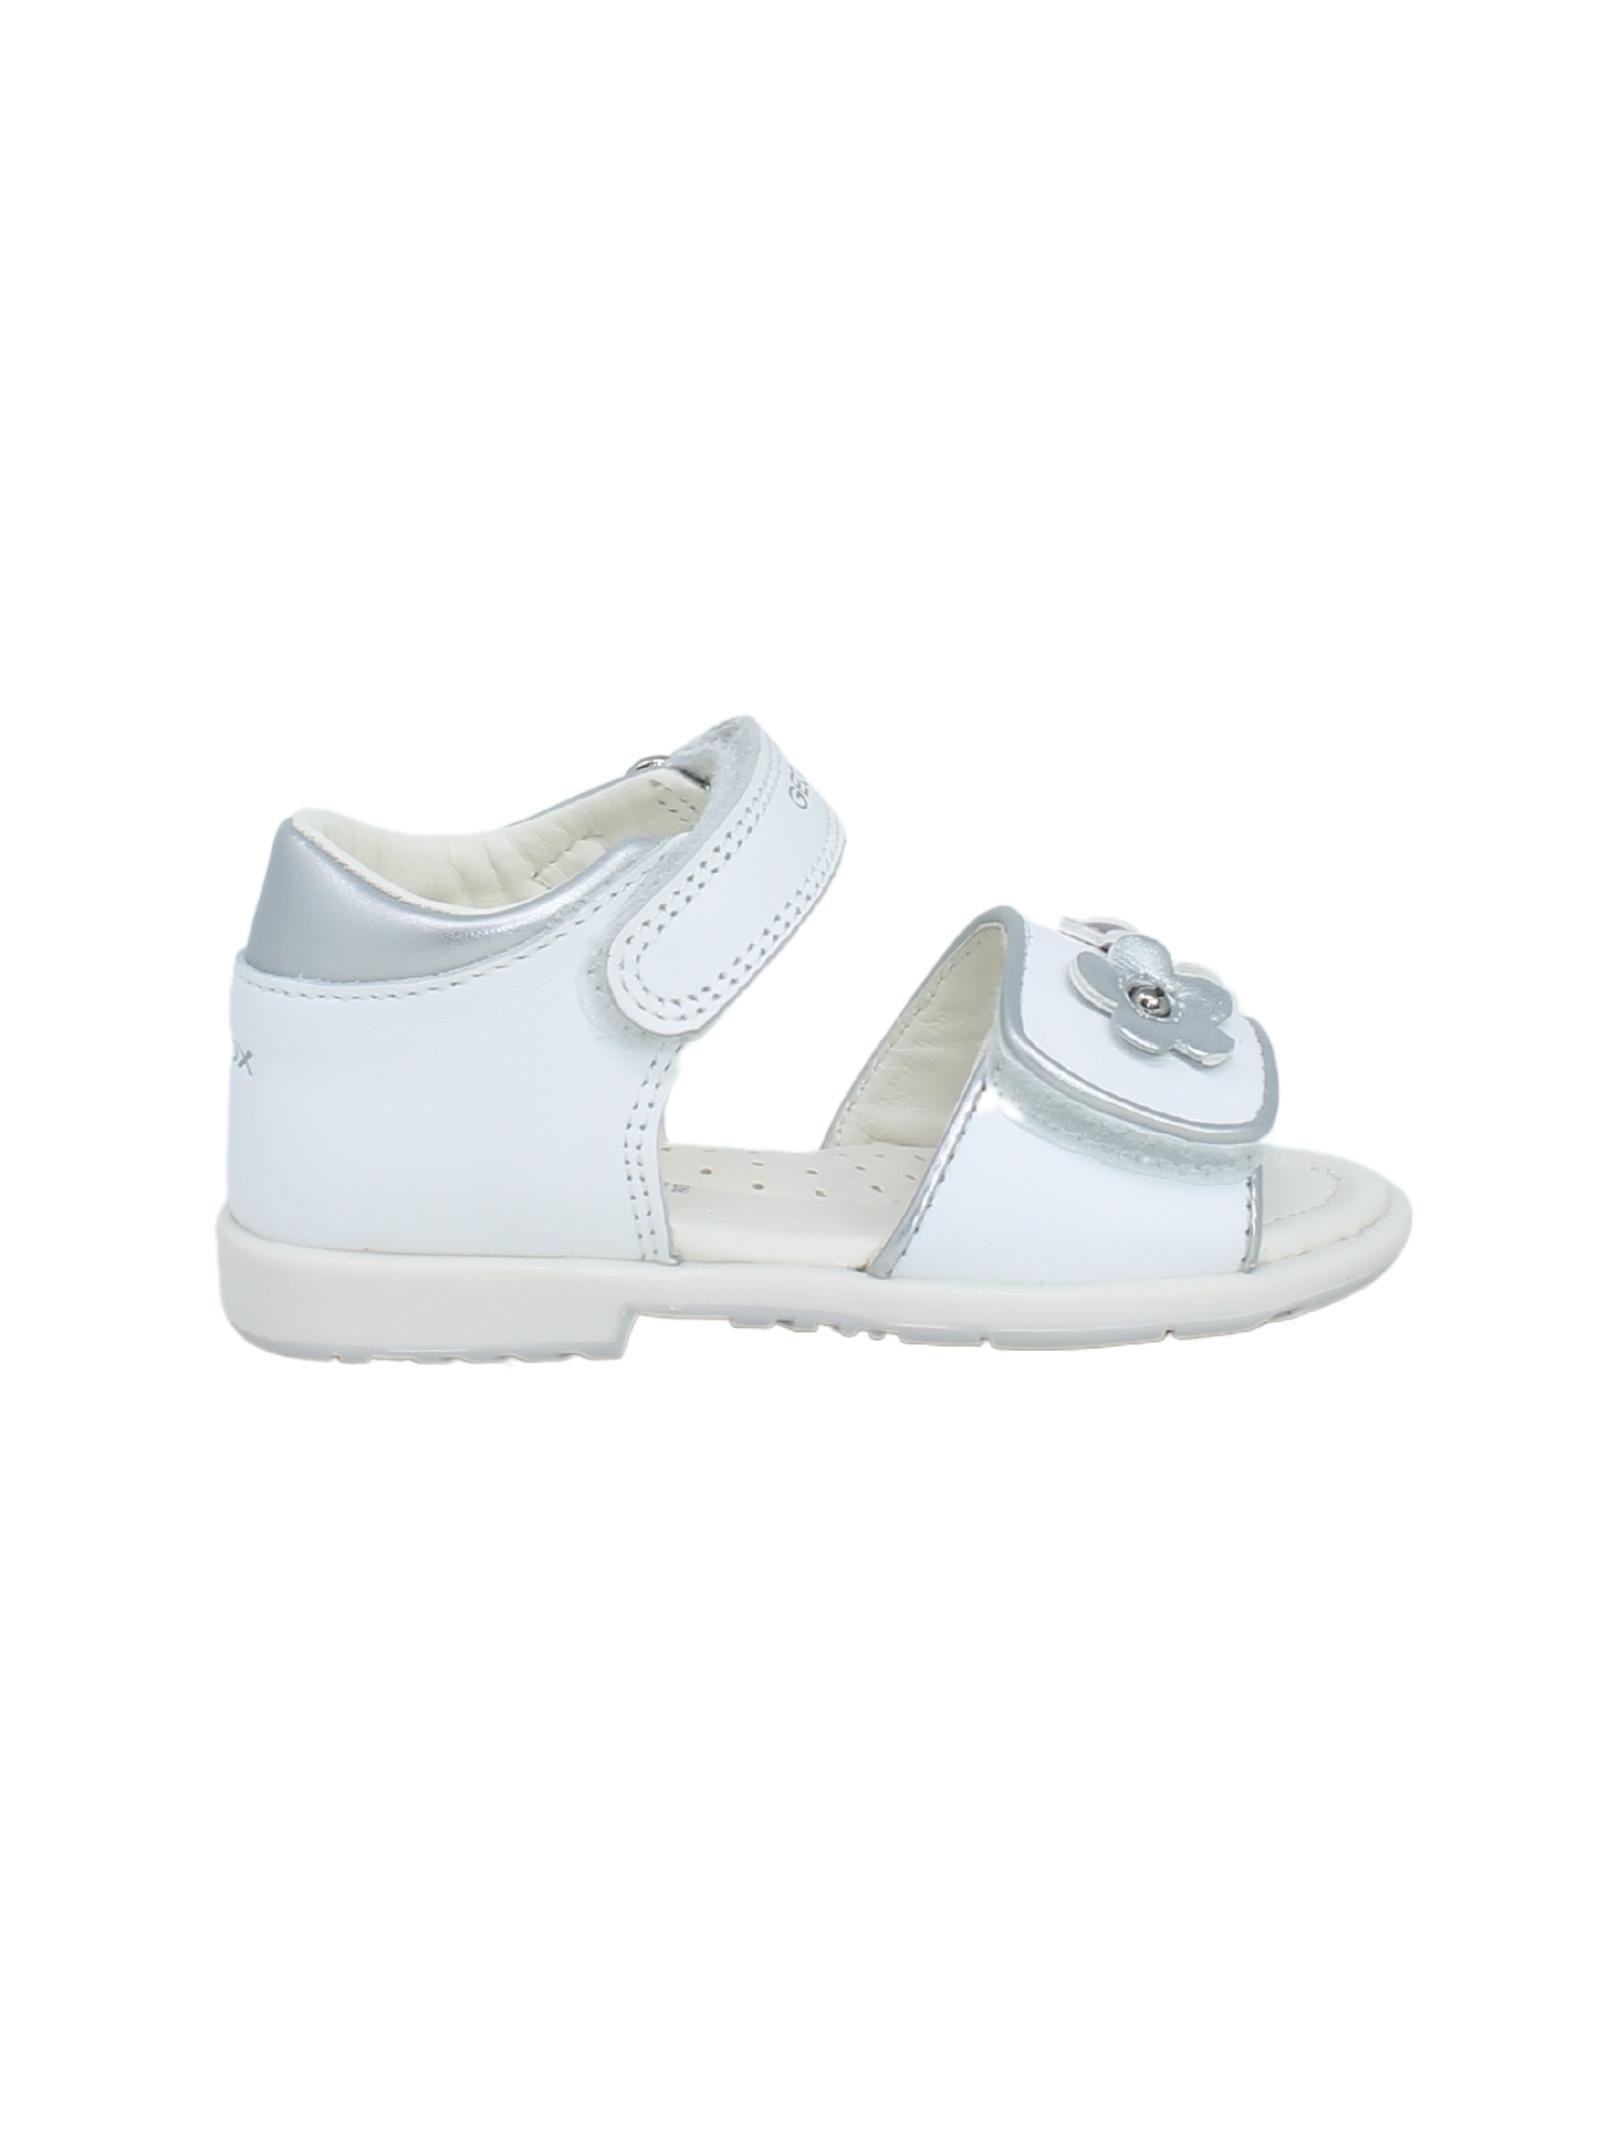 Sandalo Bambina Fiori GEOX KIDS | Sandali | B1521D085NFC1000